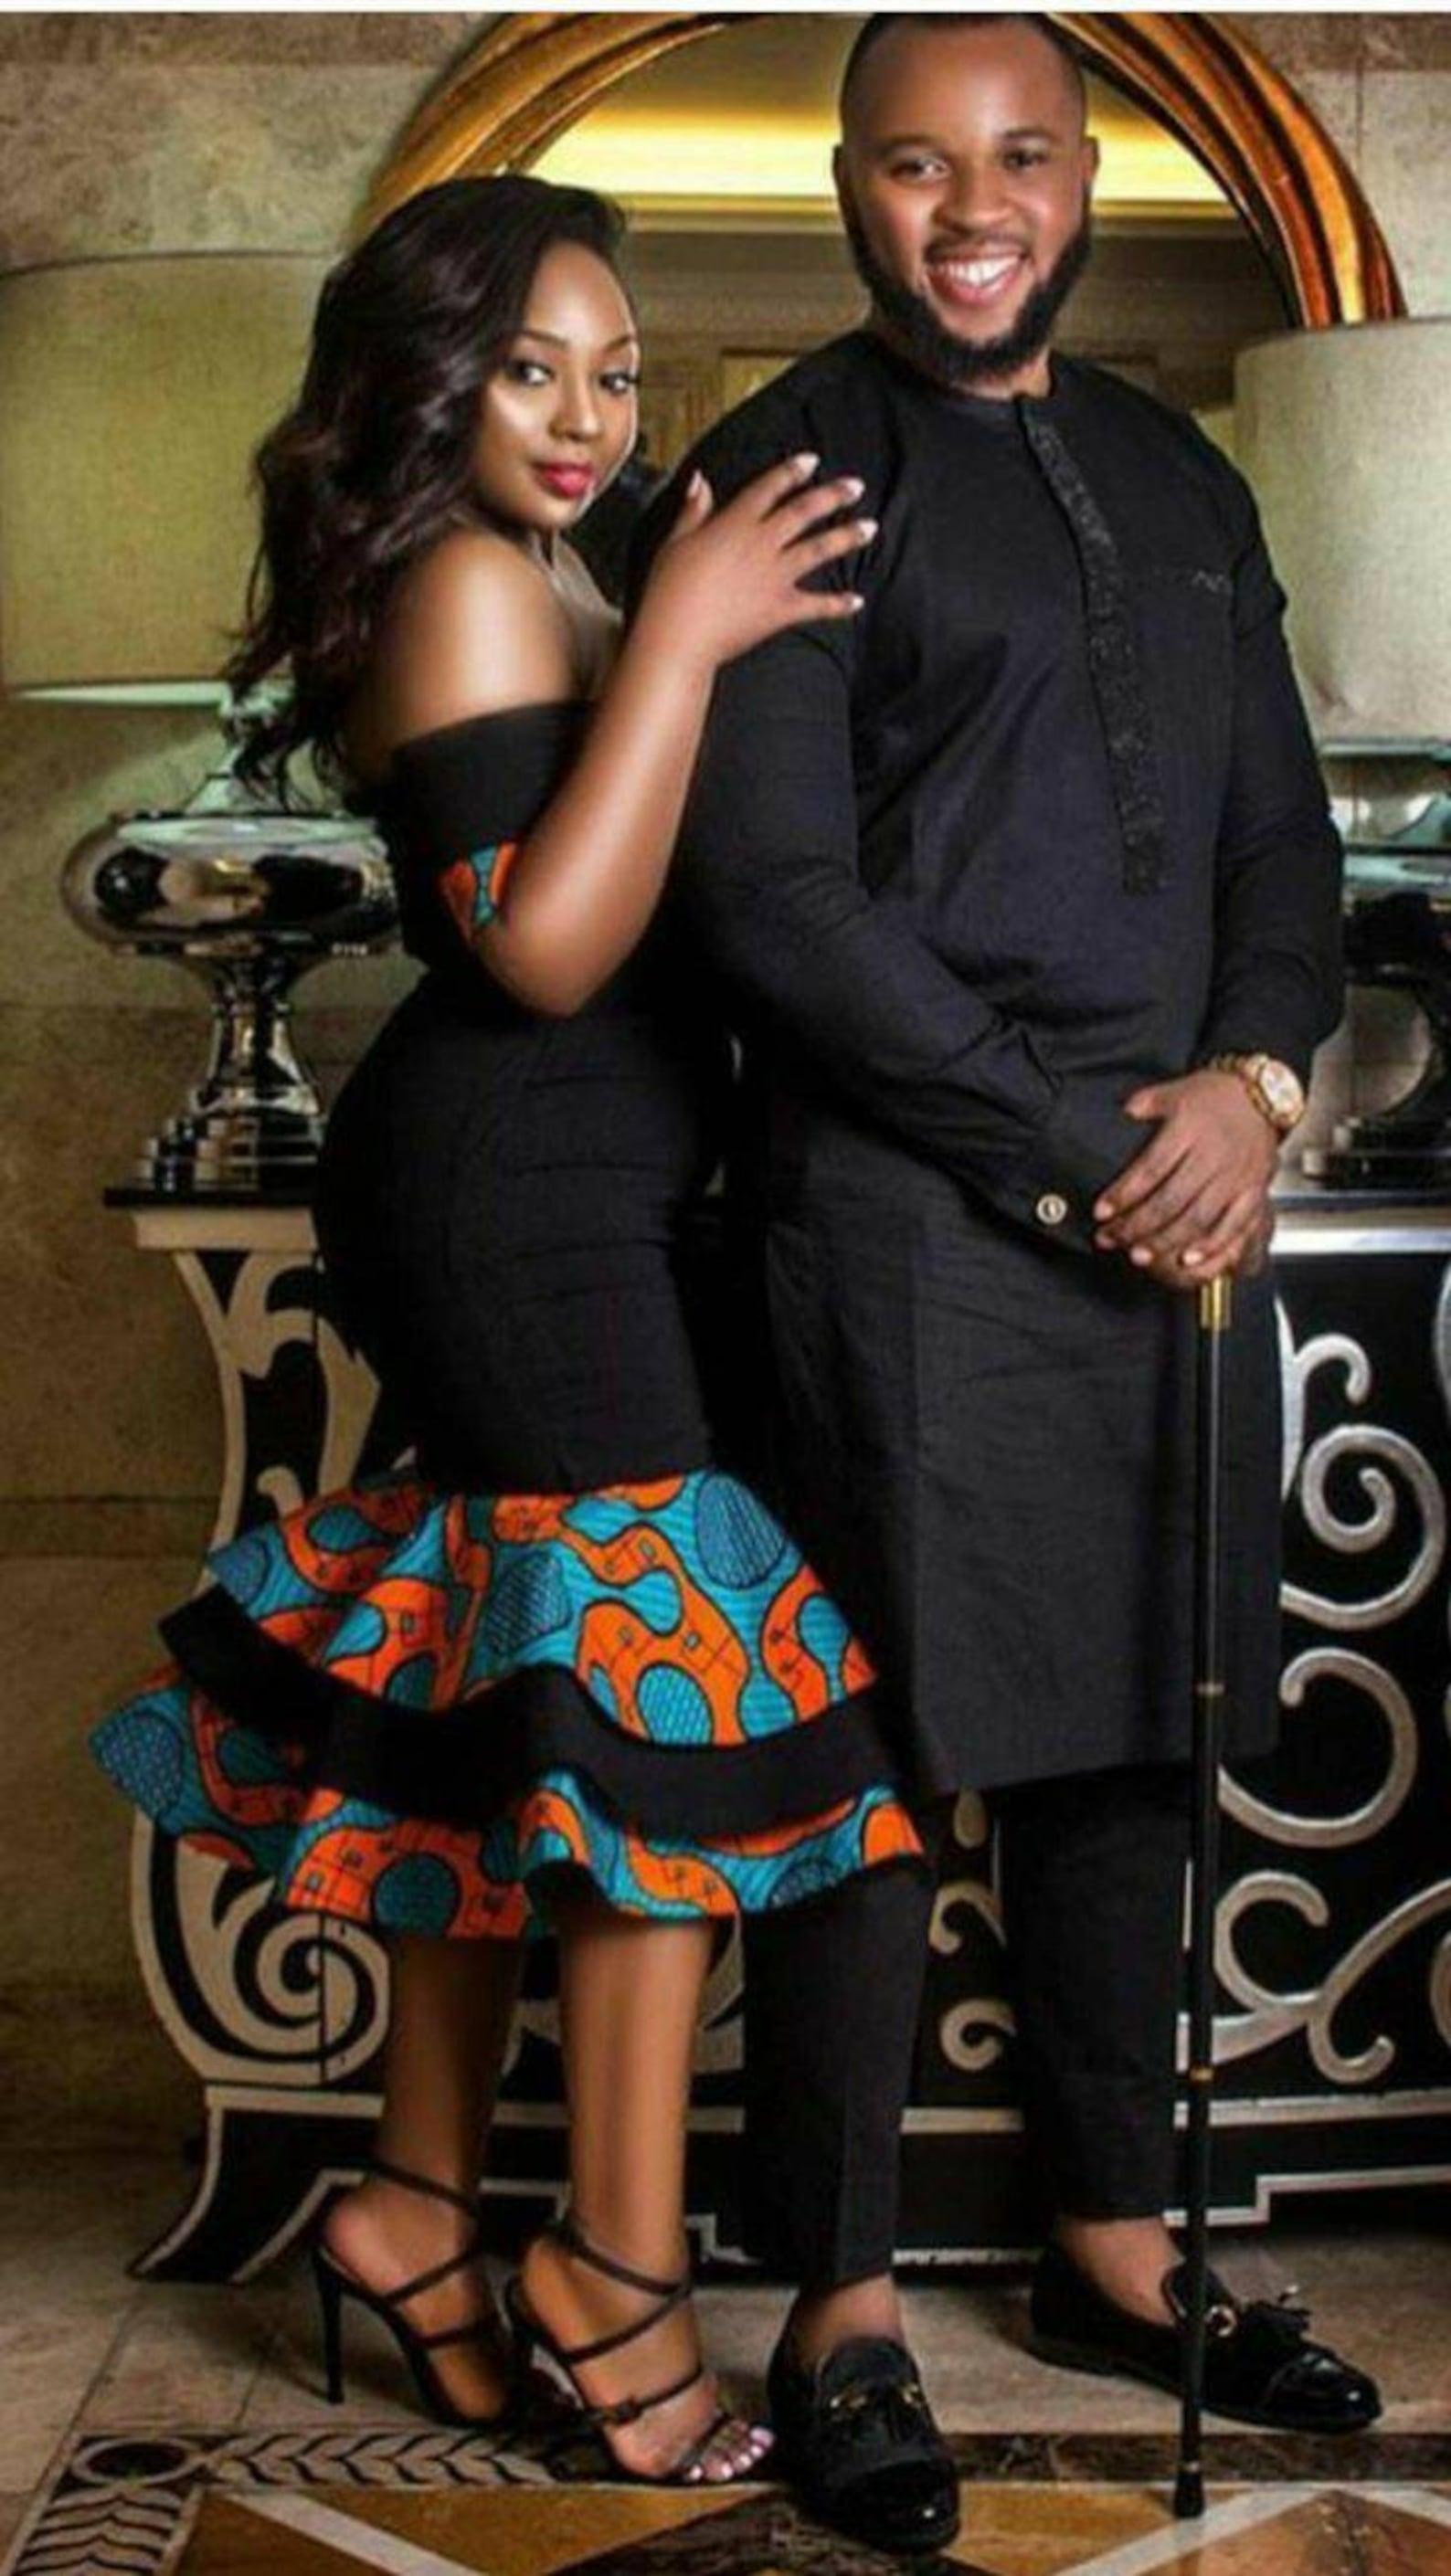 Afrikanische Paare Kleidung afrikanische Paare Outfit